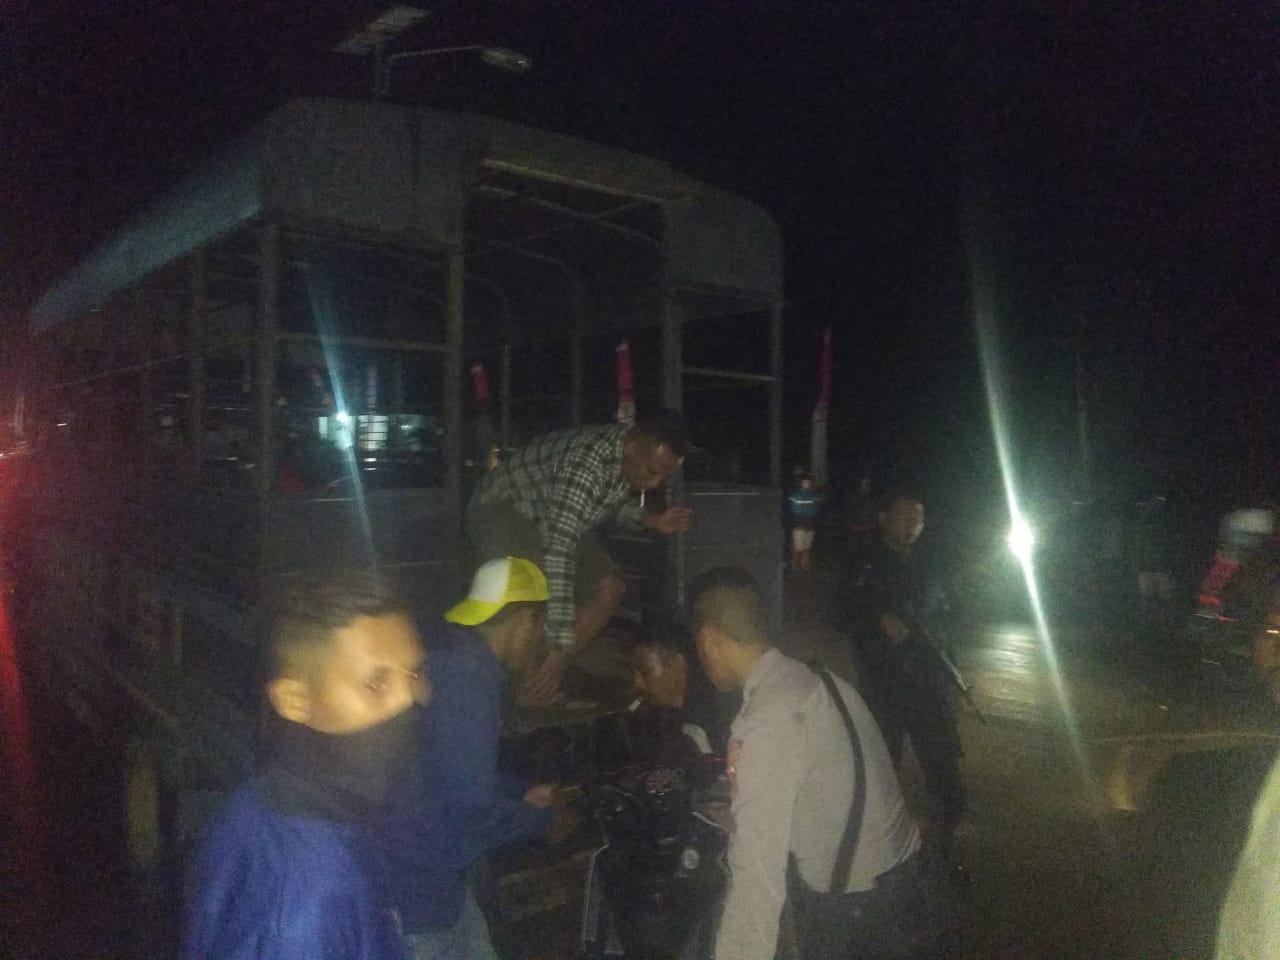 Dalmas Polres Sumba Barat, Intensifkan Patroli Malam